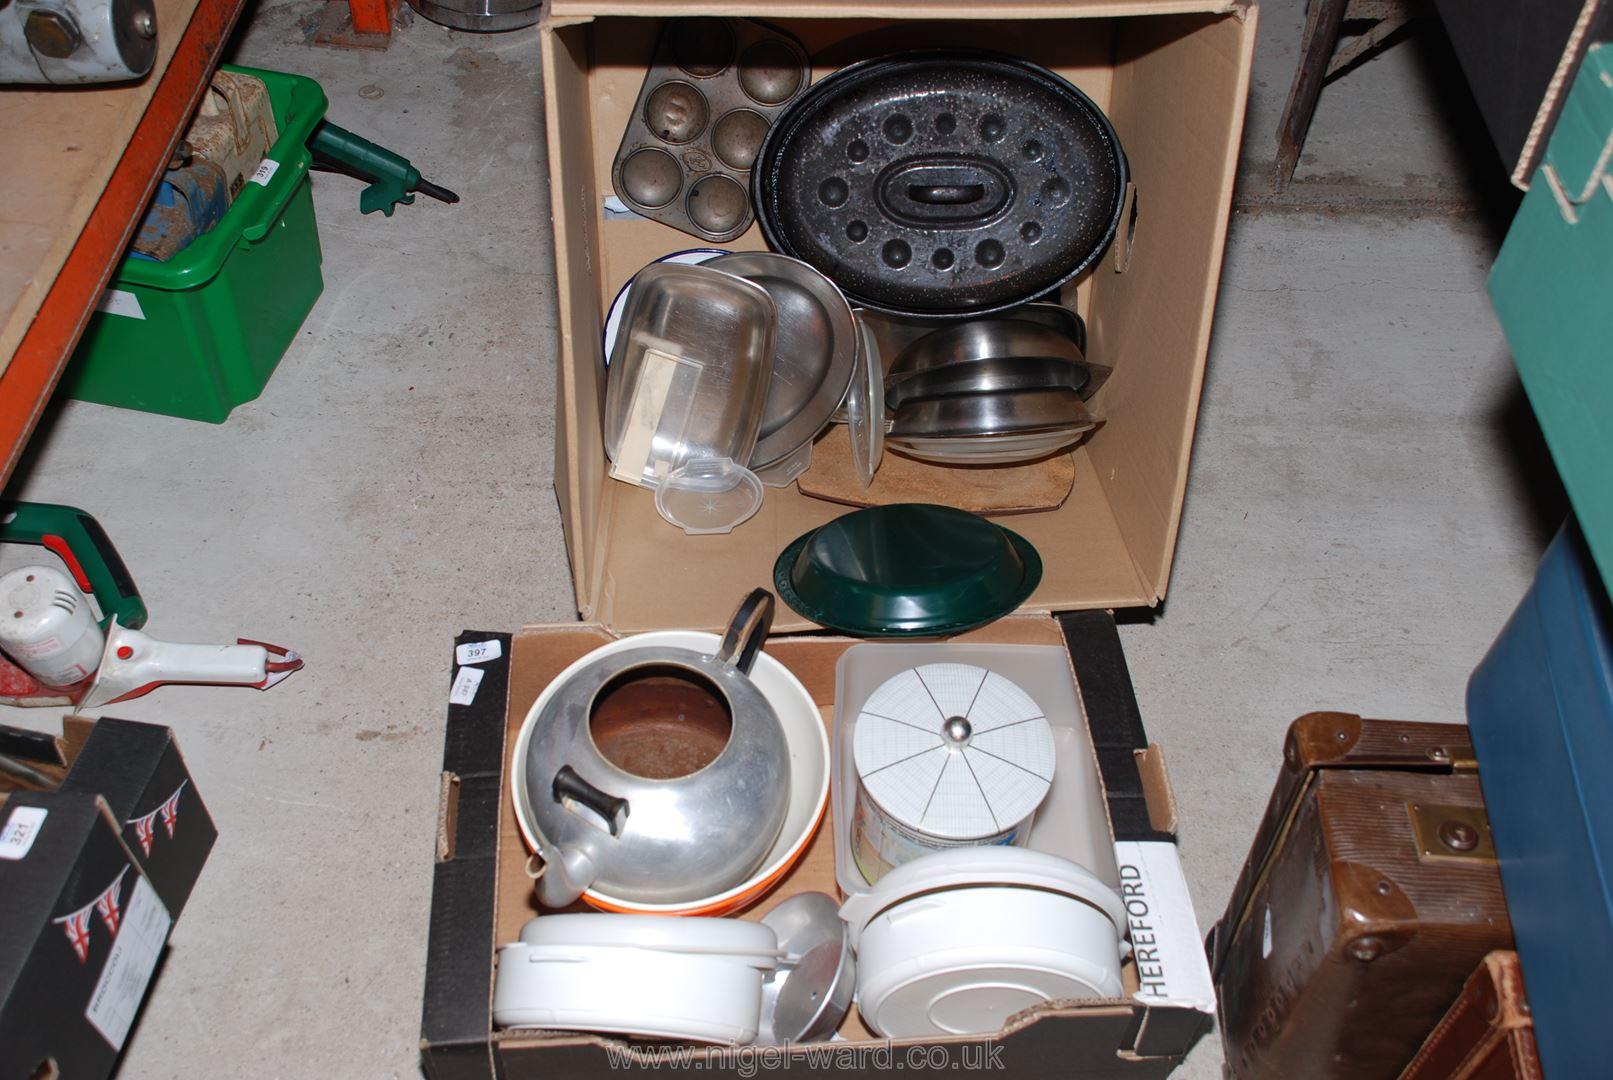 Two boxes of various kitchen pans, baking trays, etc.